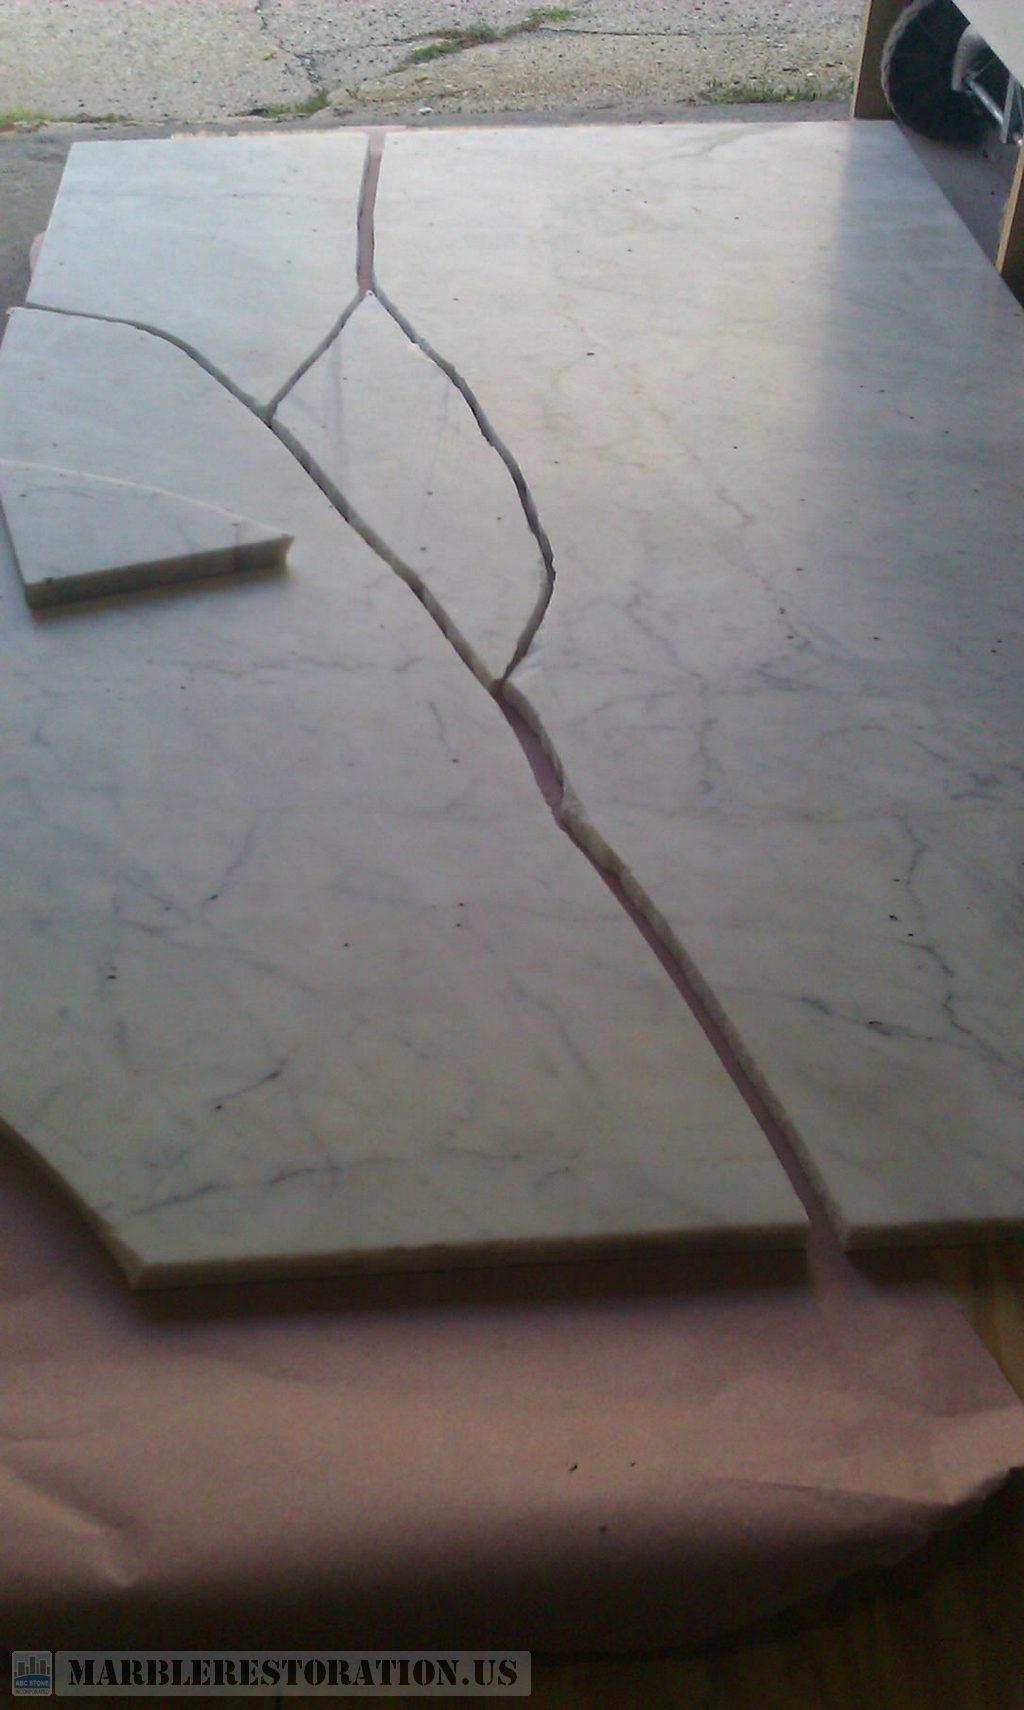 Marble Restoration, Polishing, Cleaning